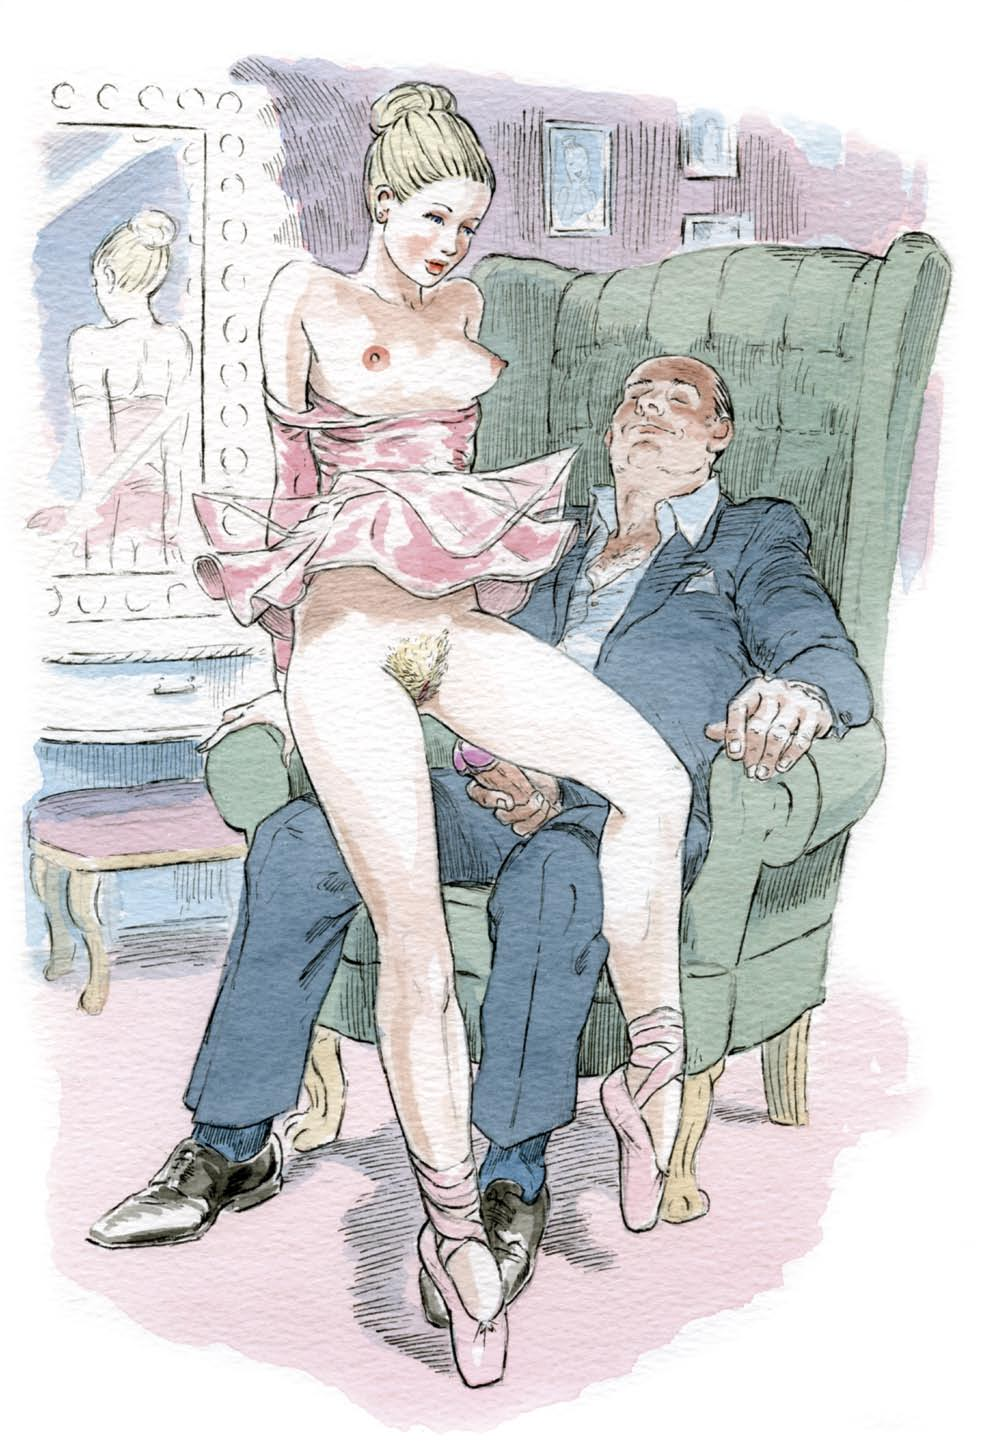 Напомнило ретро эротика рисунок бесплатно луг, махая